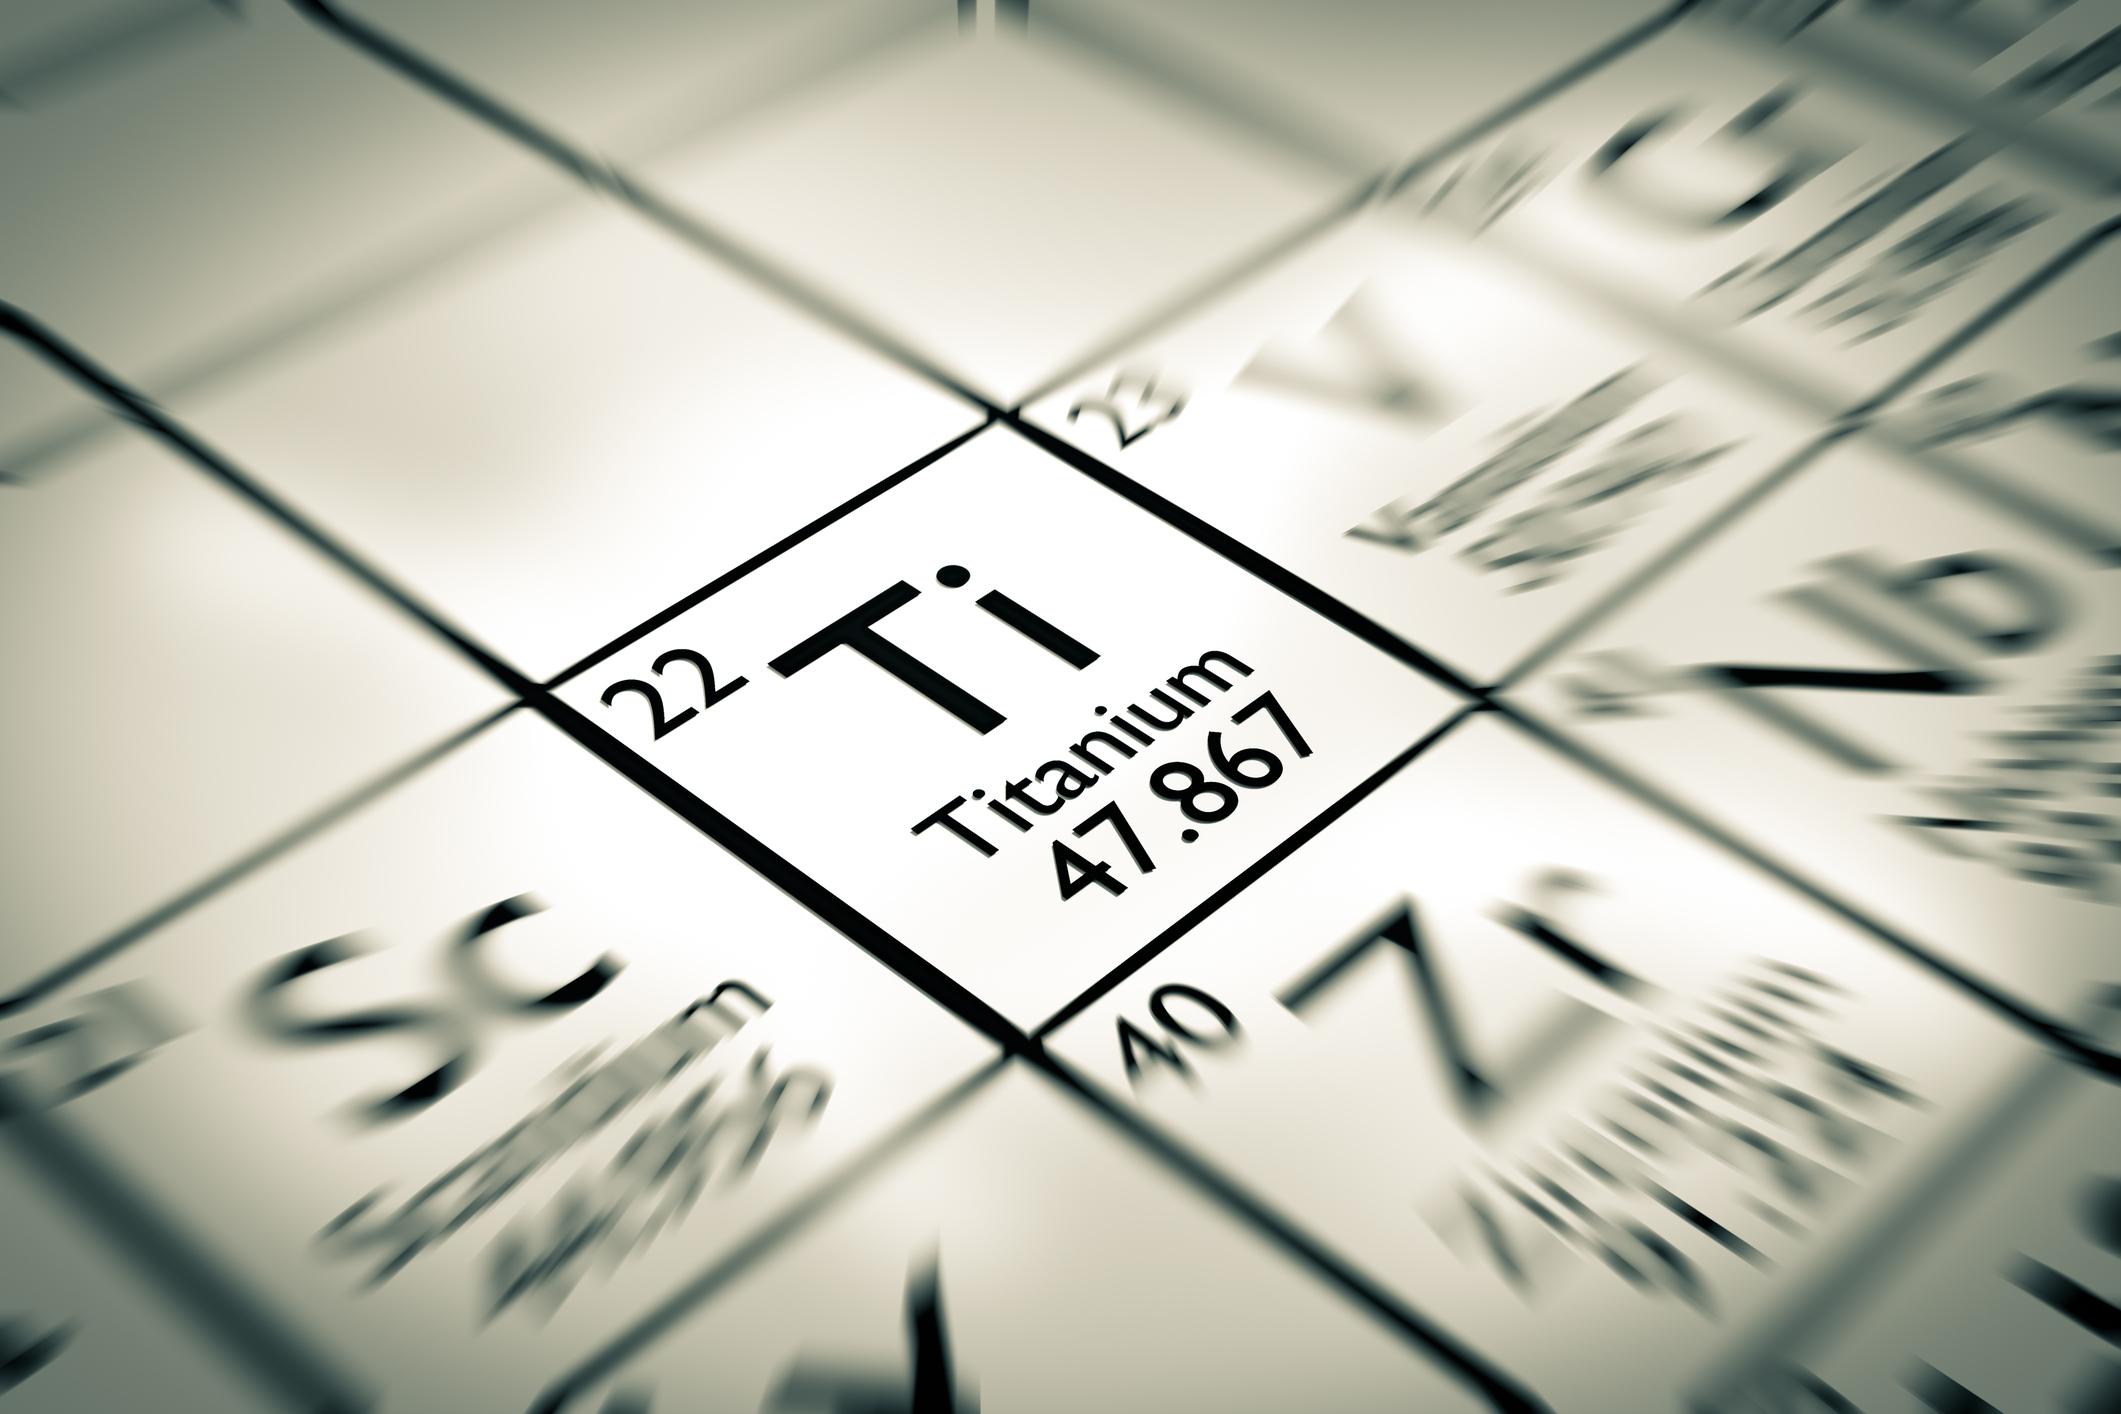 A periodic table featuring the element titanium.